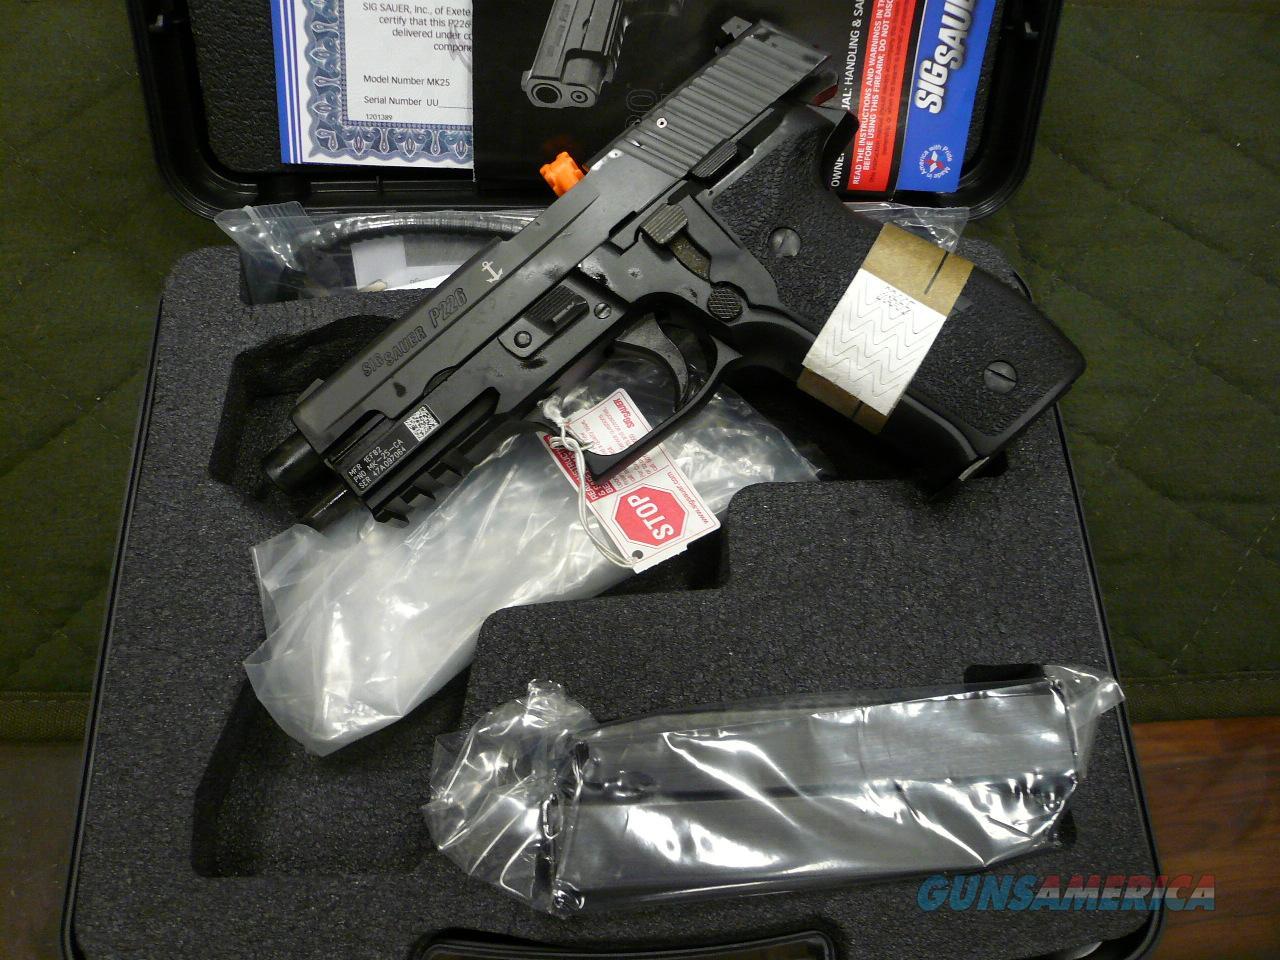 P226/MK25 NAVY 9mm NIB  Guns > Pistols > Sig - Sauer/Sigarms Pistols > P226